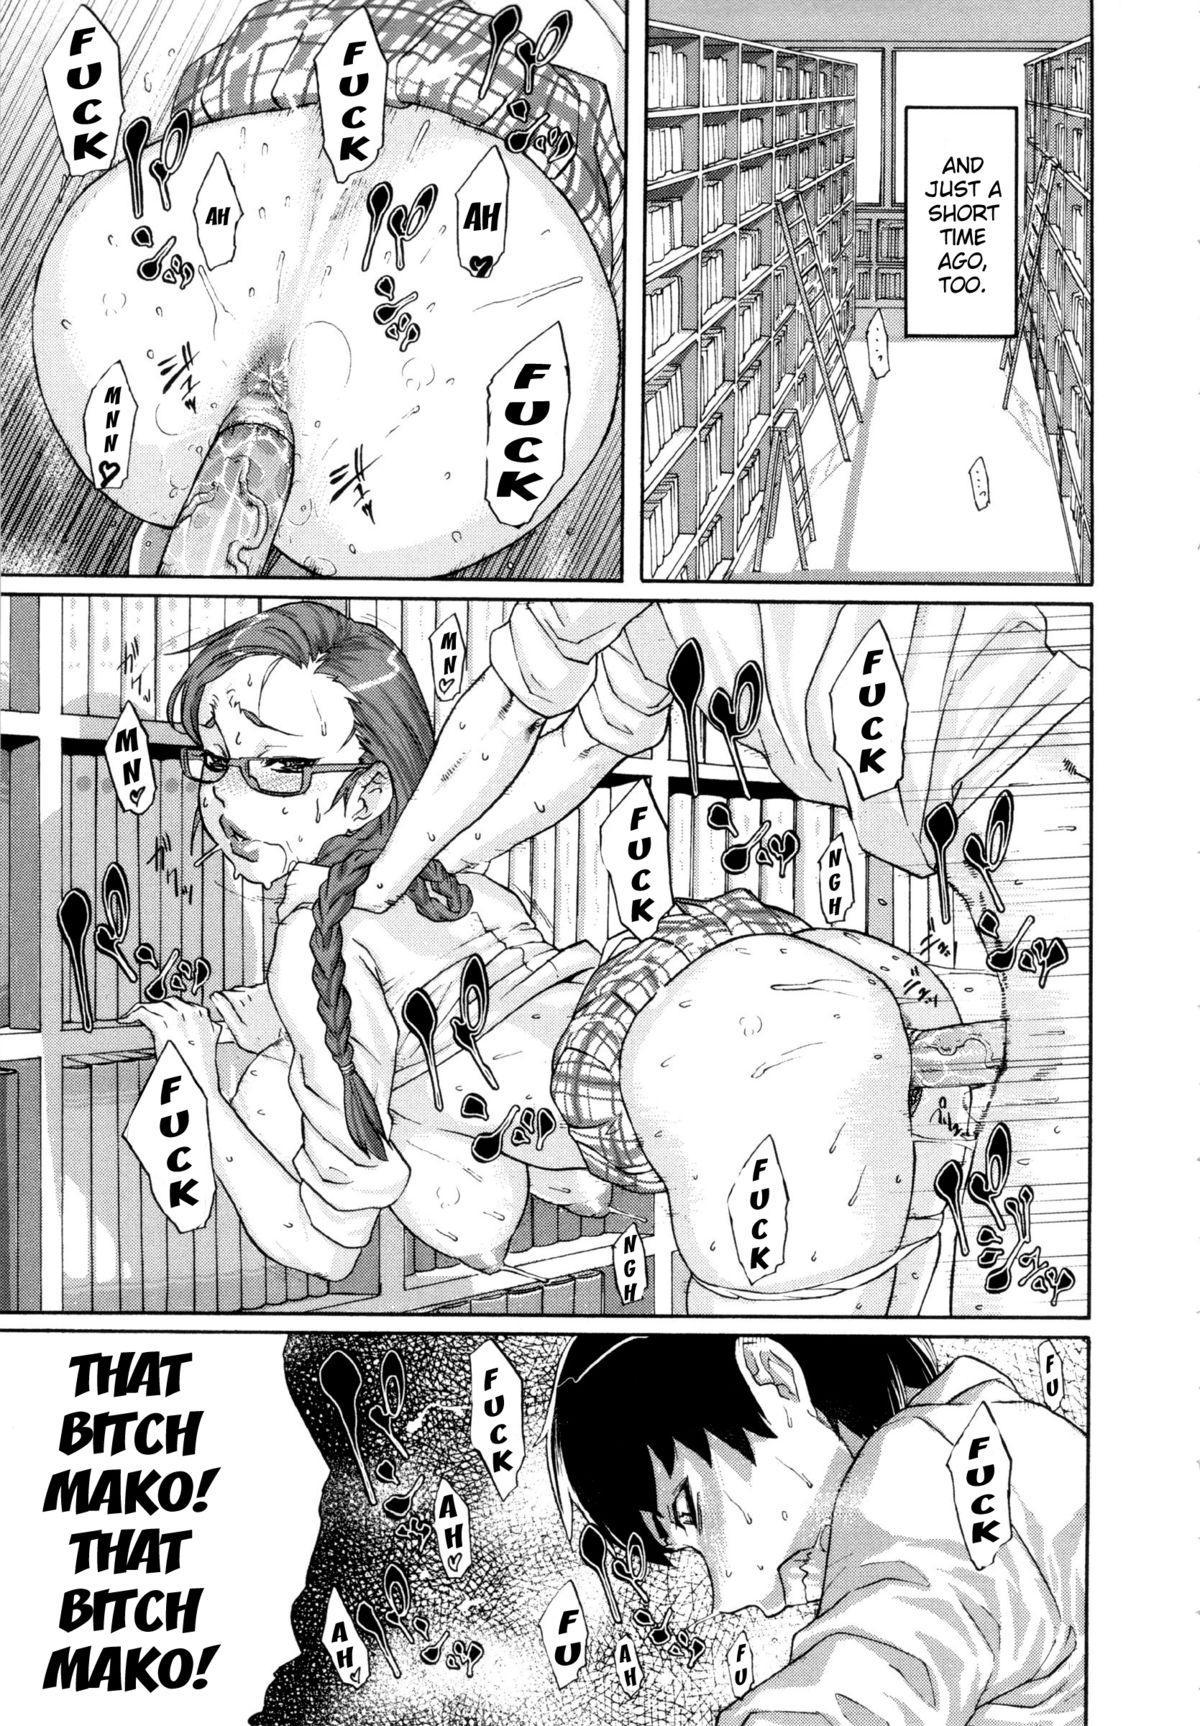 [Royal Koyanagi] Orgy Treasure Mansion GOLD Ch. 9 - 10  -  Nozomu Triangle & Orgy Showroom (Tank Version) [English] [Decensored] 4